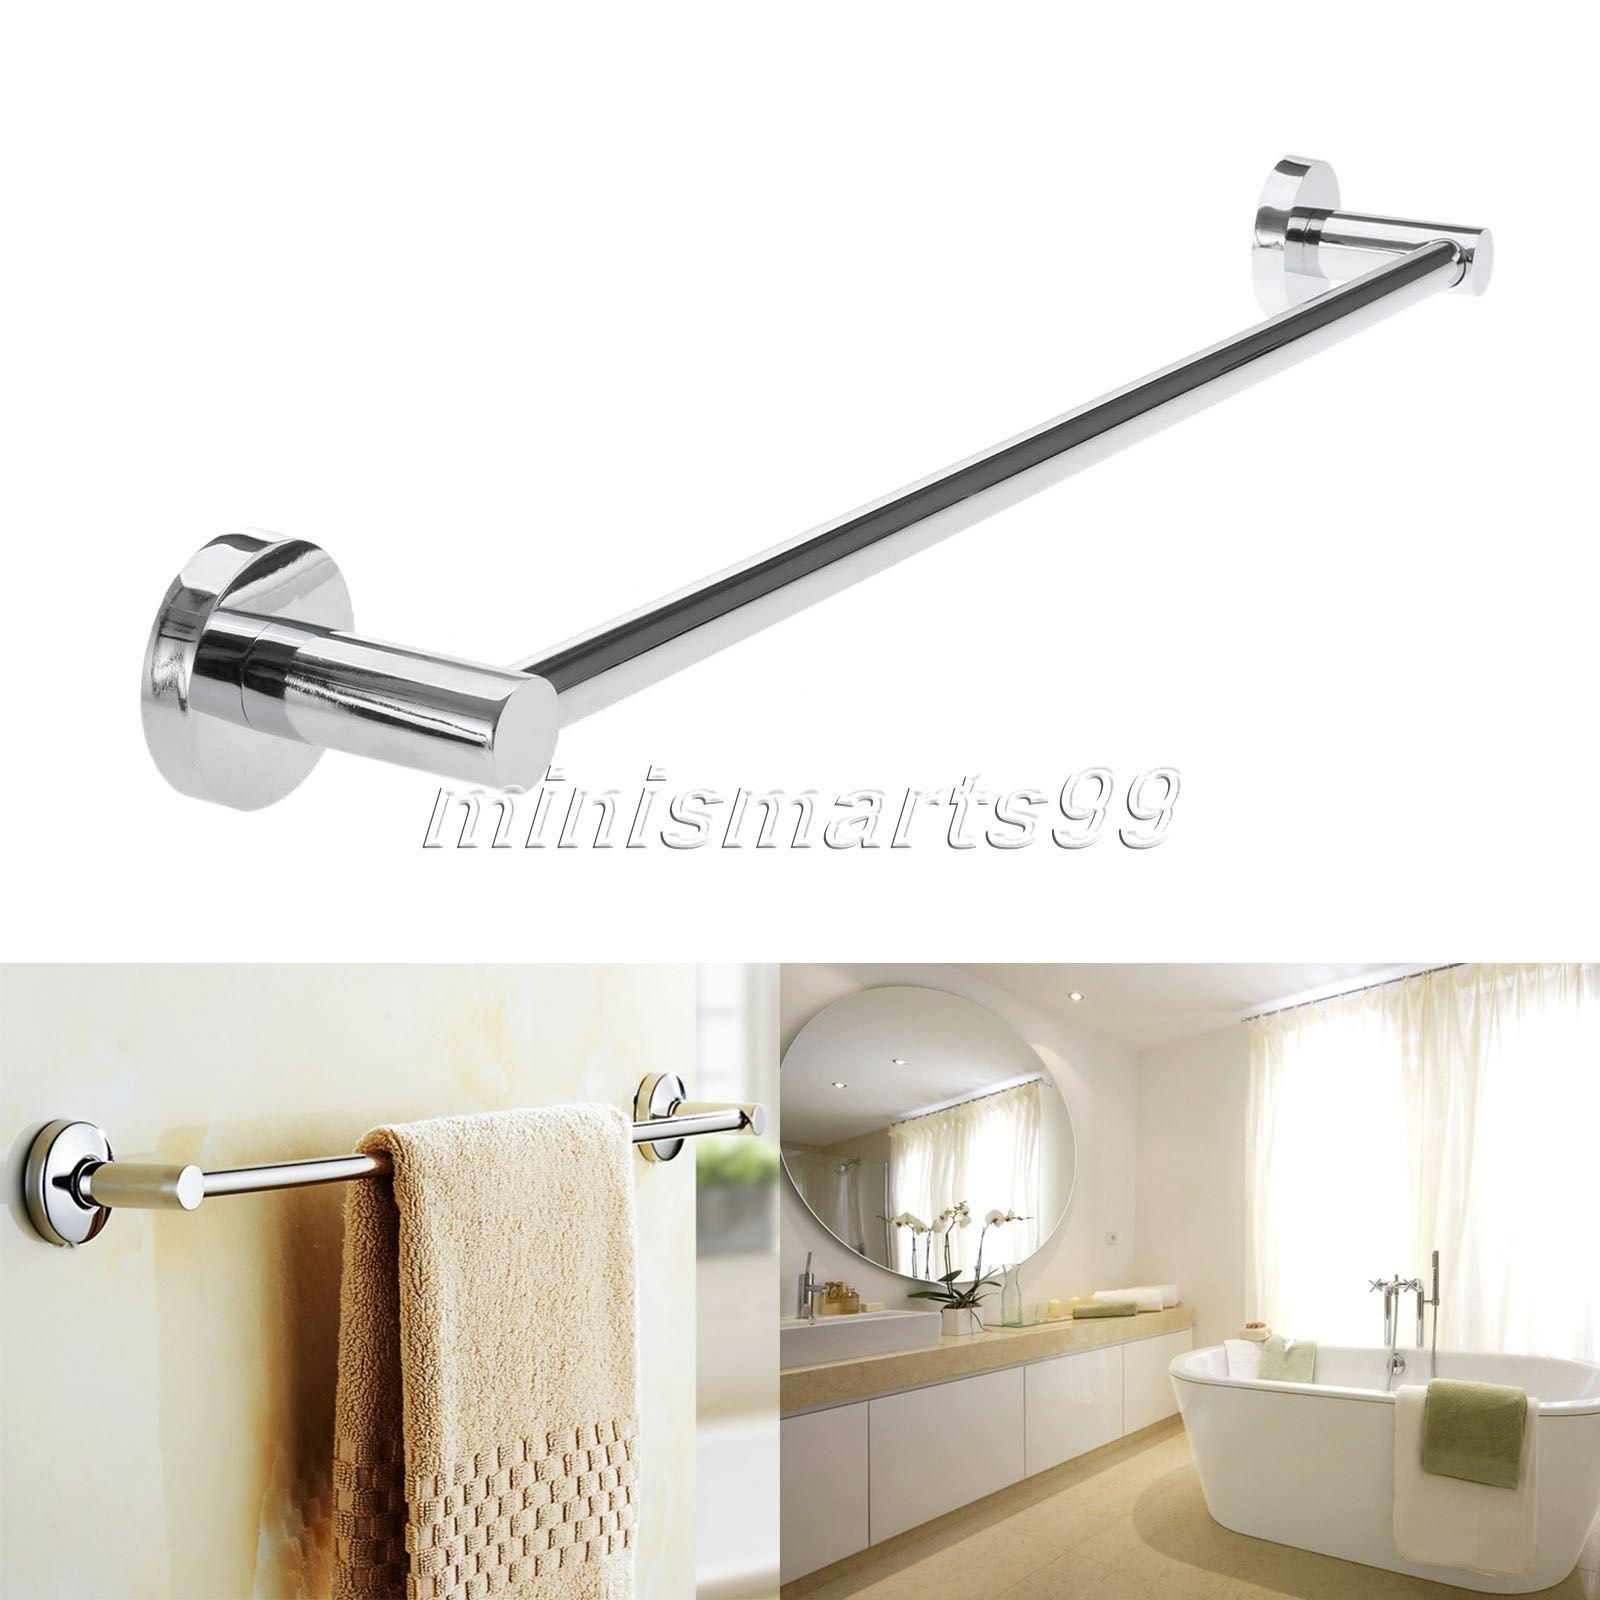 Cacys Store 60cm Steel Towel Rack Holder Wall-Mounted Bathroom Towel Holders Single Pole Towel Bars Bath Storage Shelf Bathroom Accessories